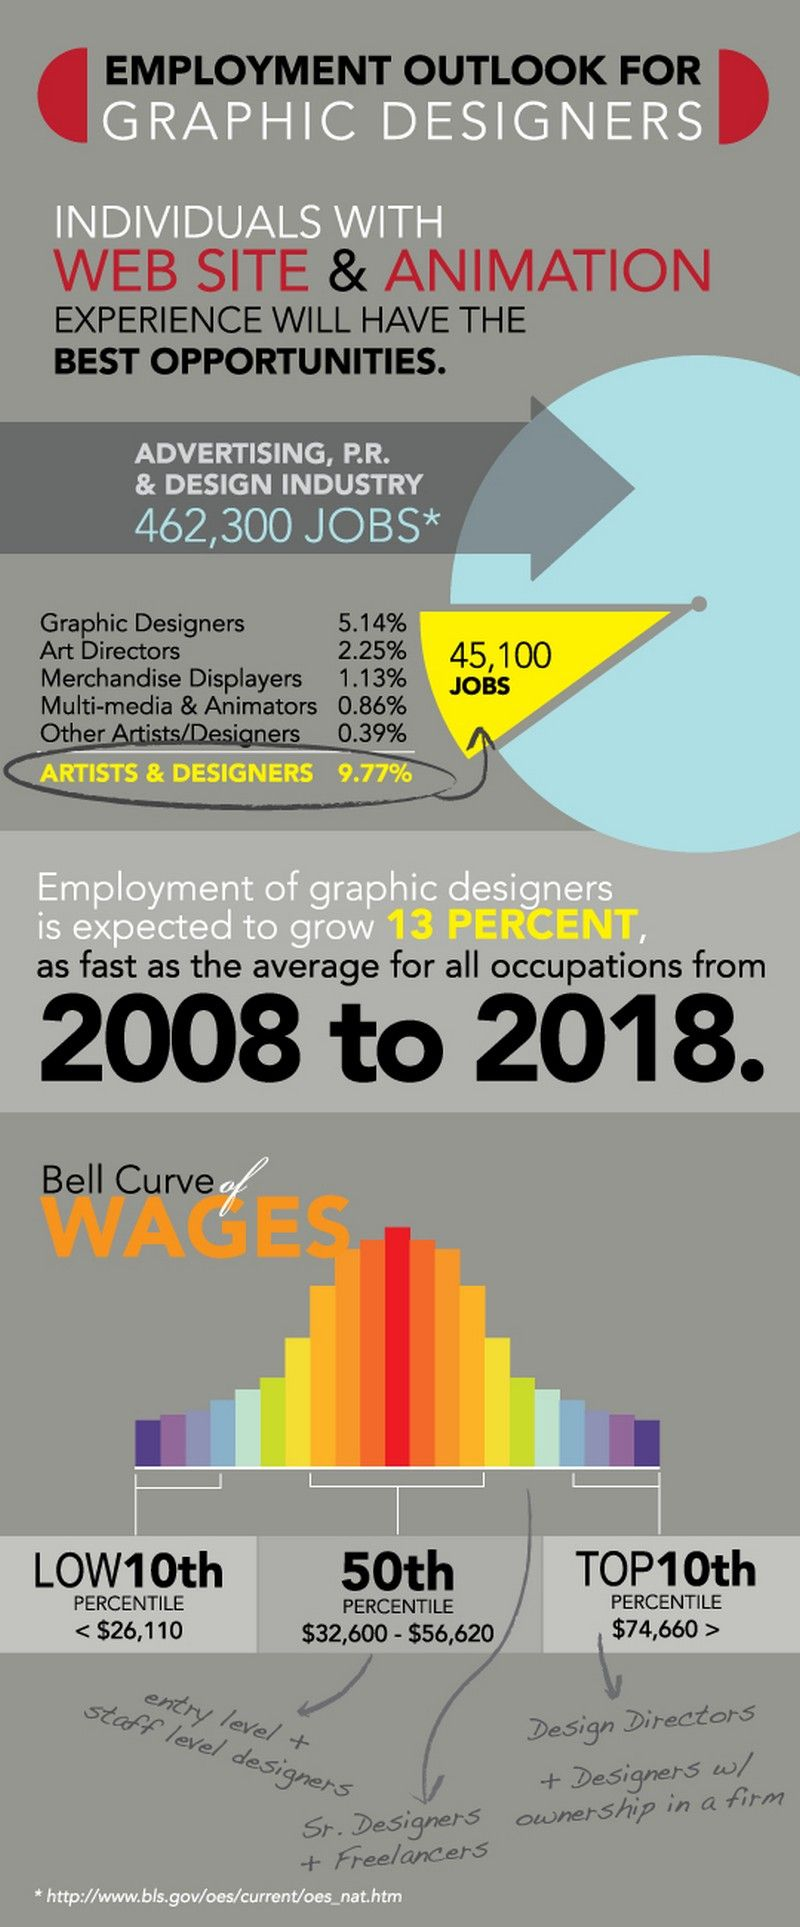 Graphic Design Jobs Outlook